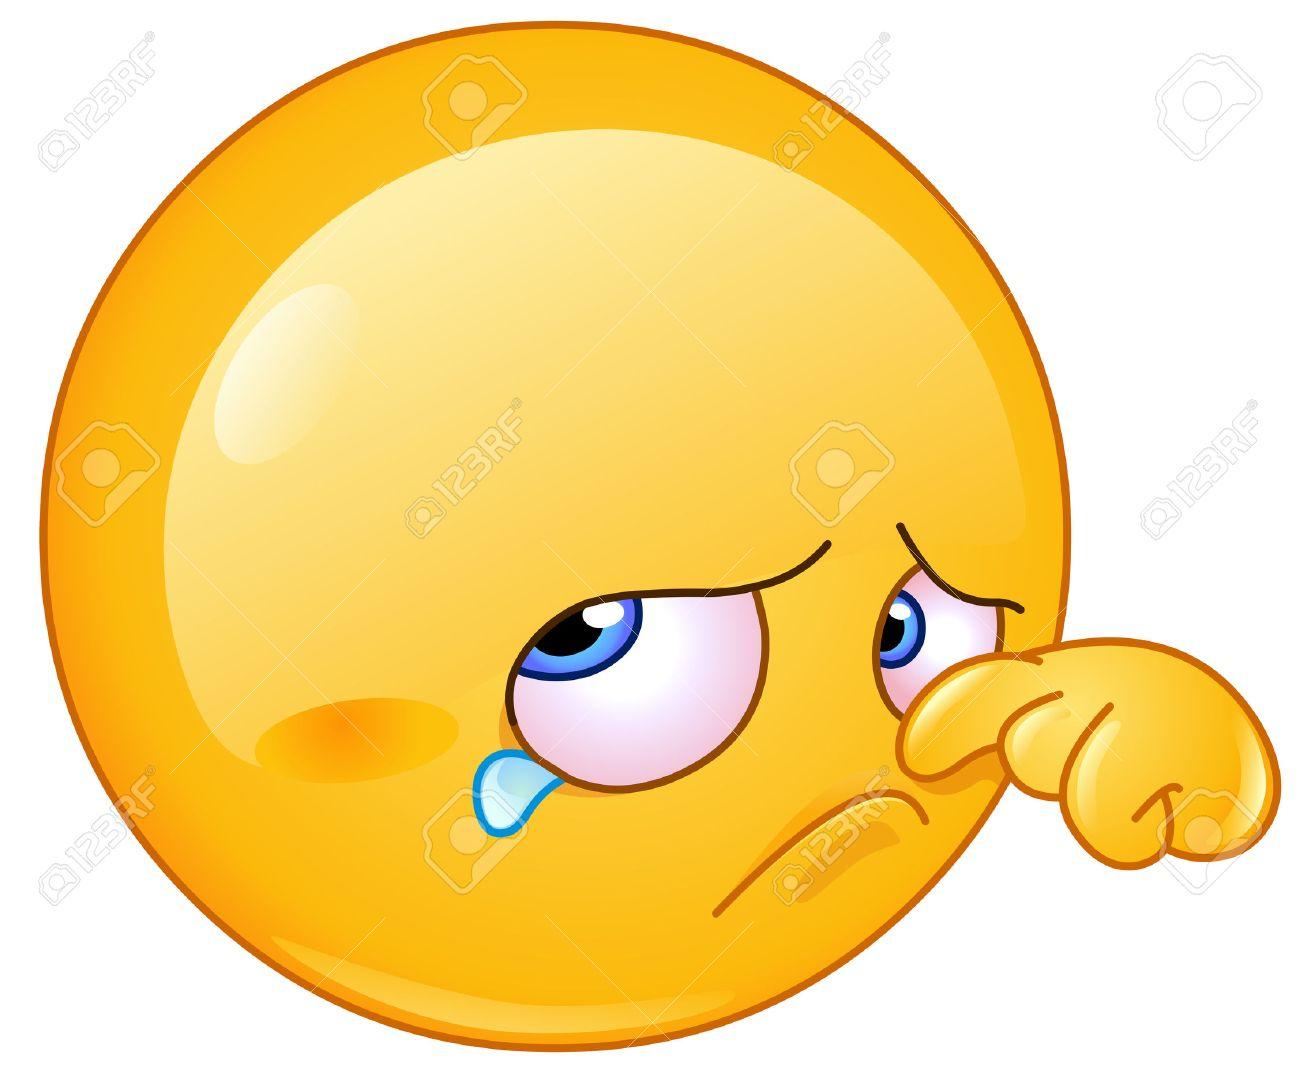 sad emoticon wiping tear royalty free cliparts, vectors, and stock